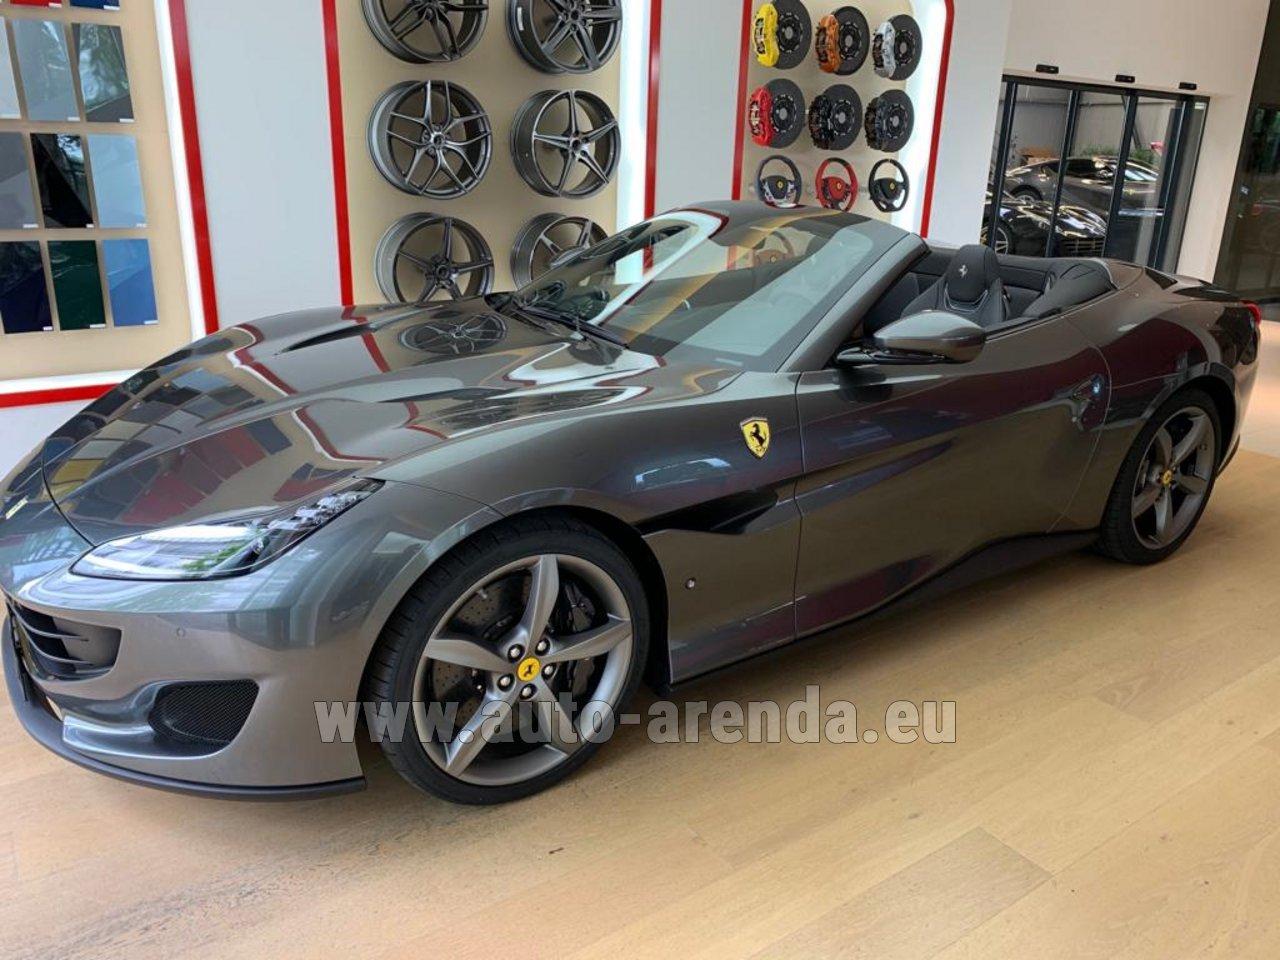 Rent The Ferrari Portofino Car In Freiburg